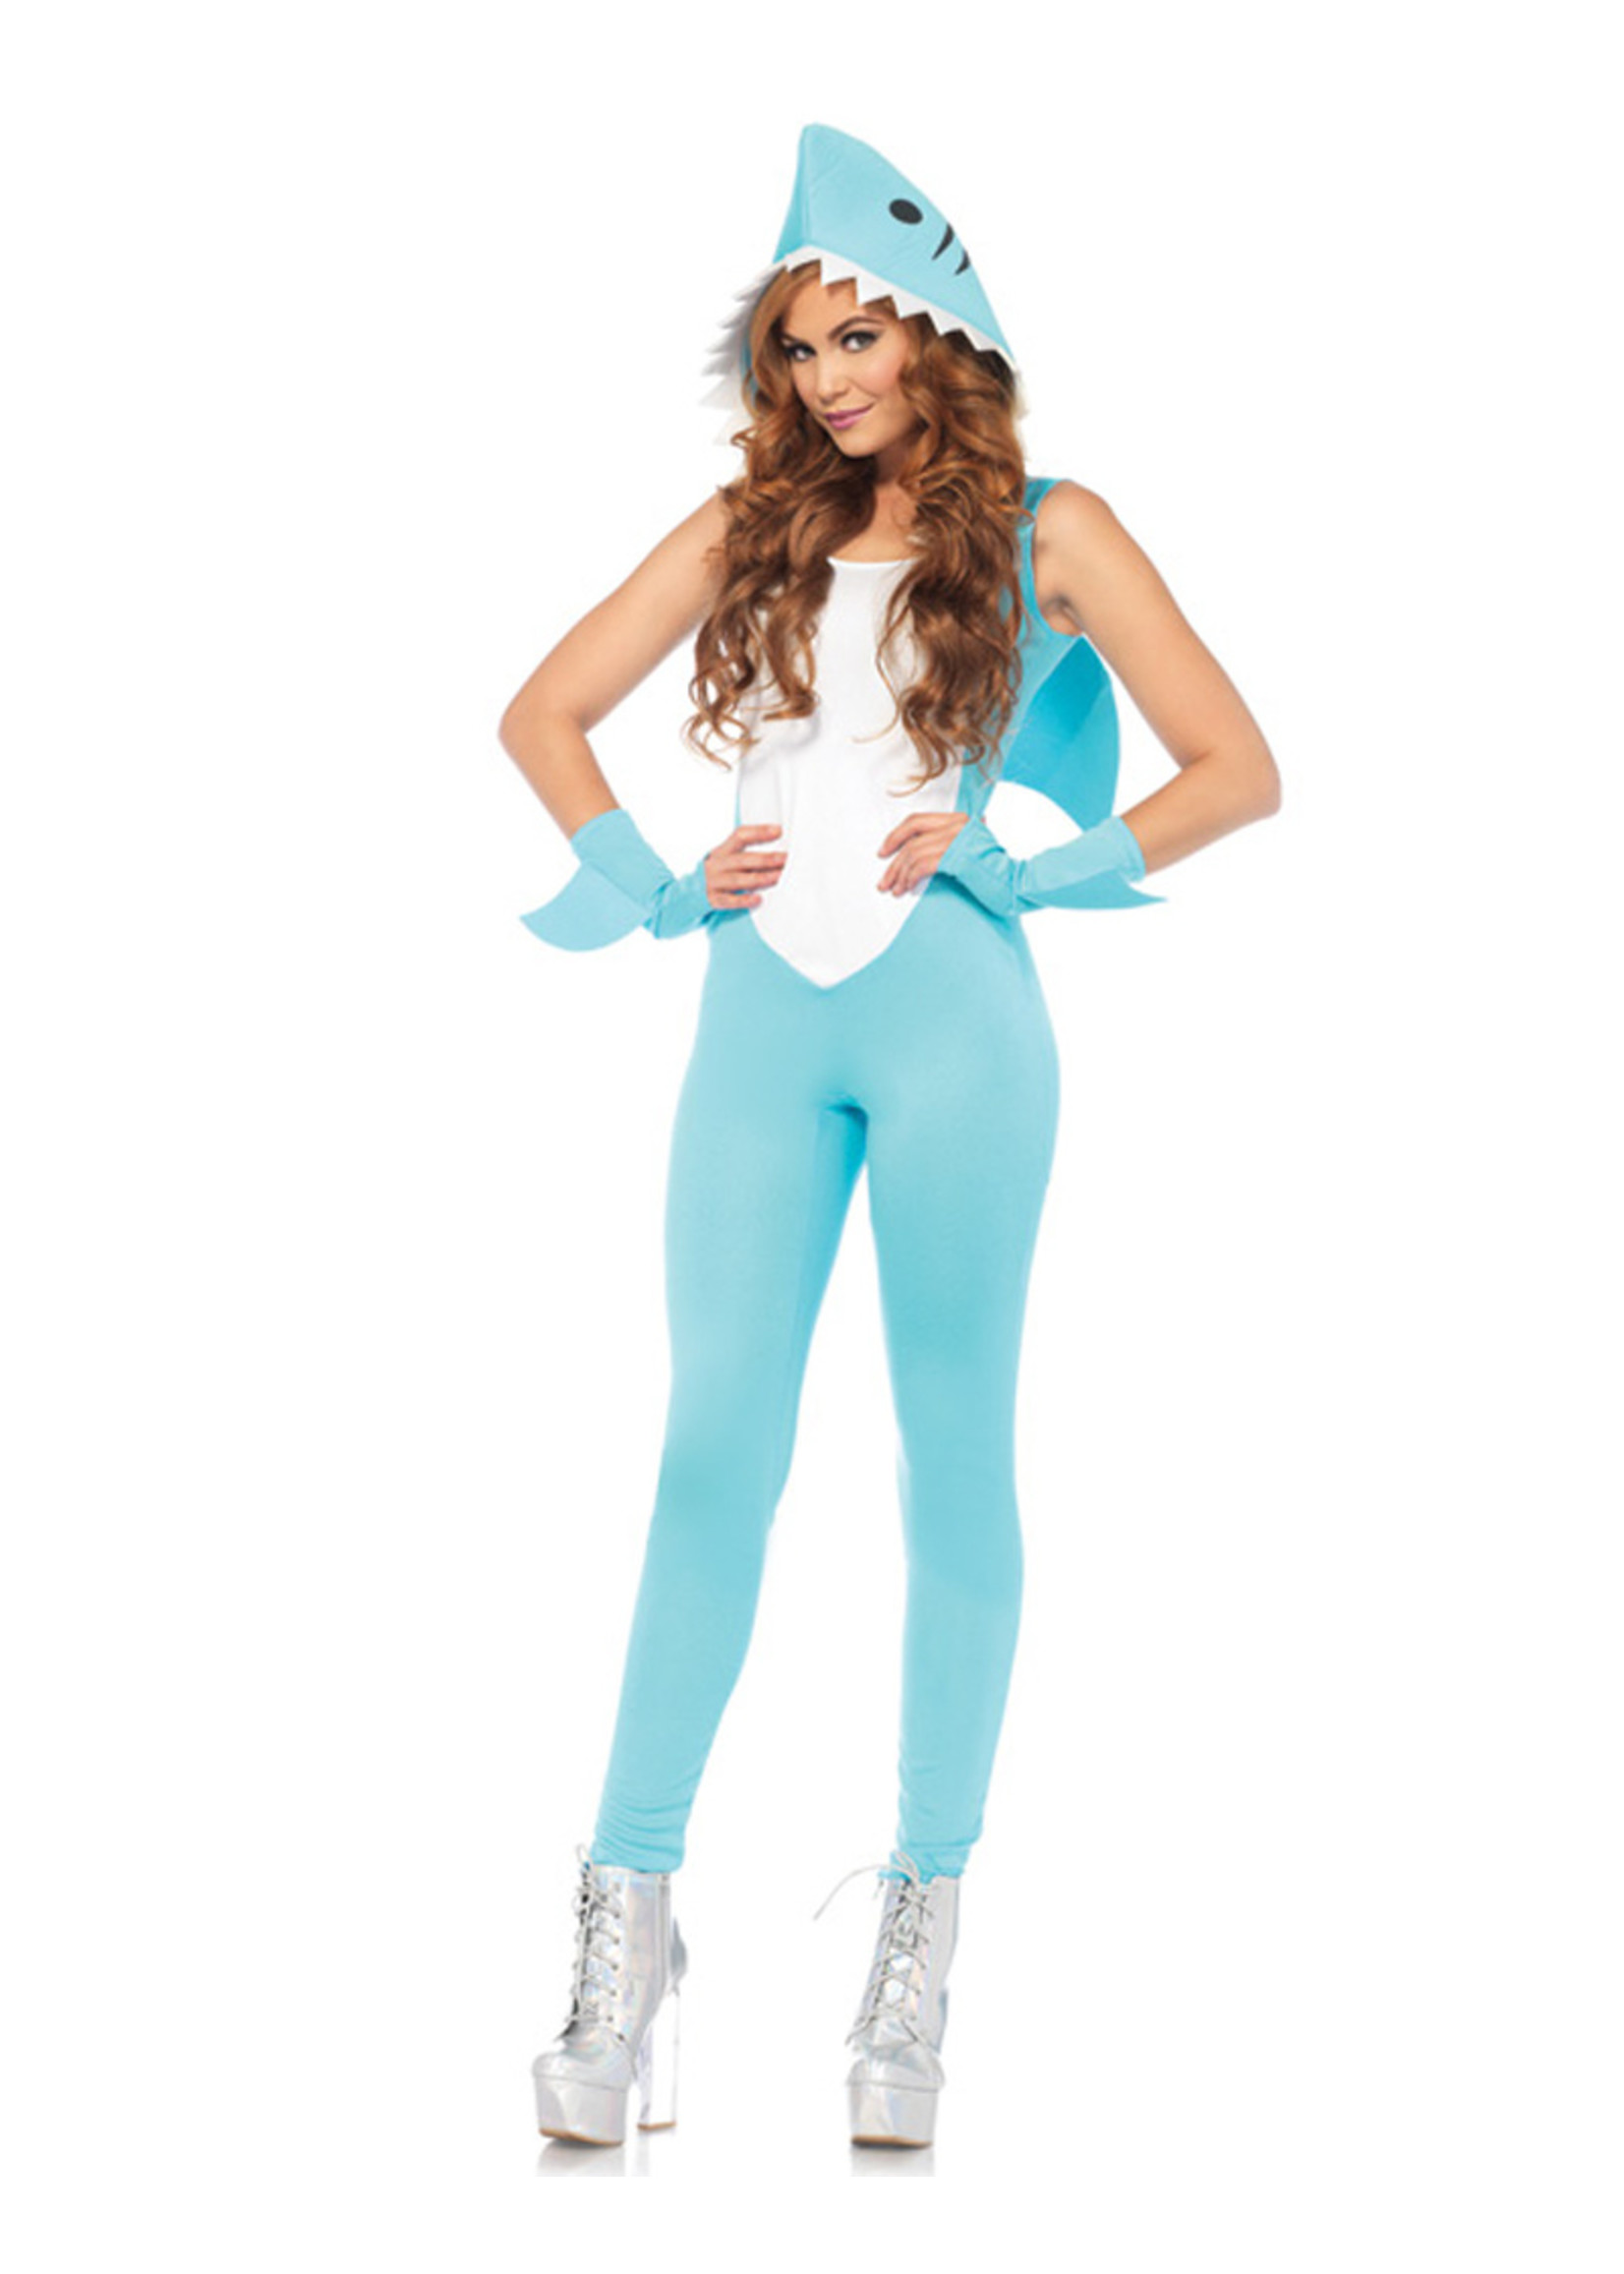 Deadly Land Shark Costume - Women's